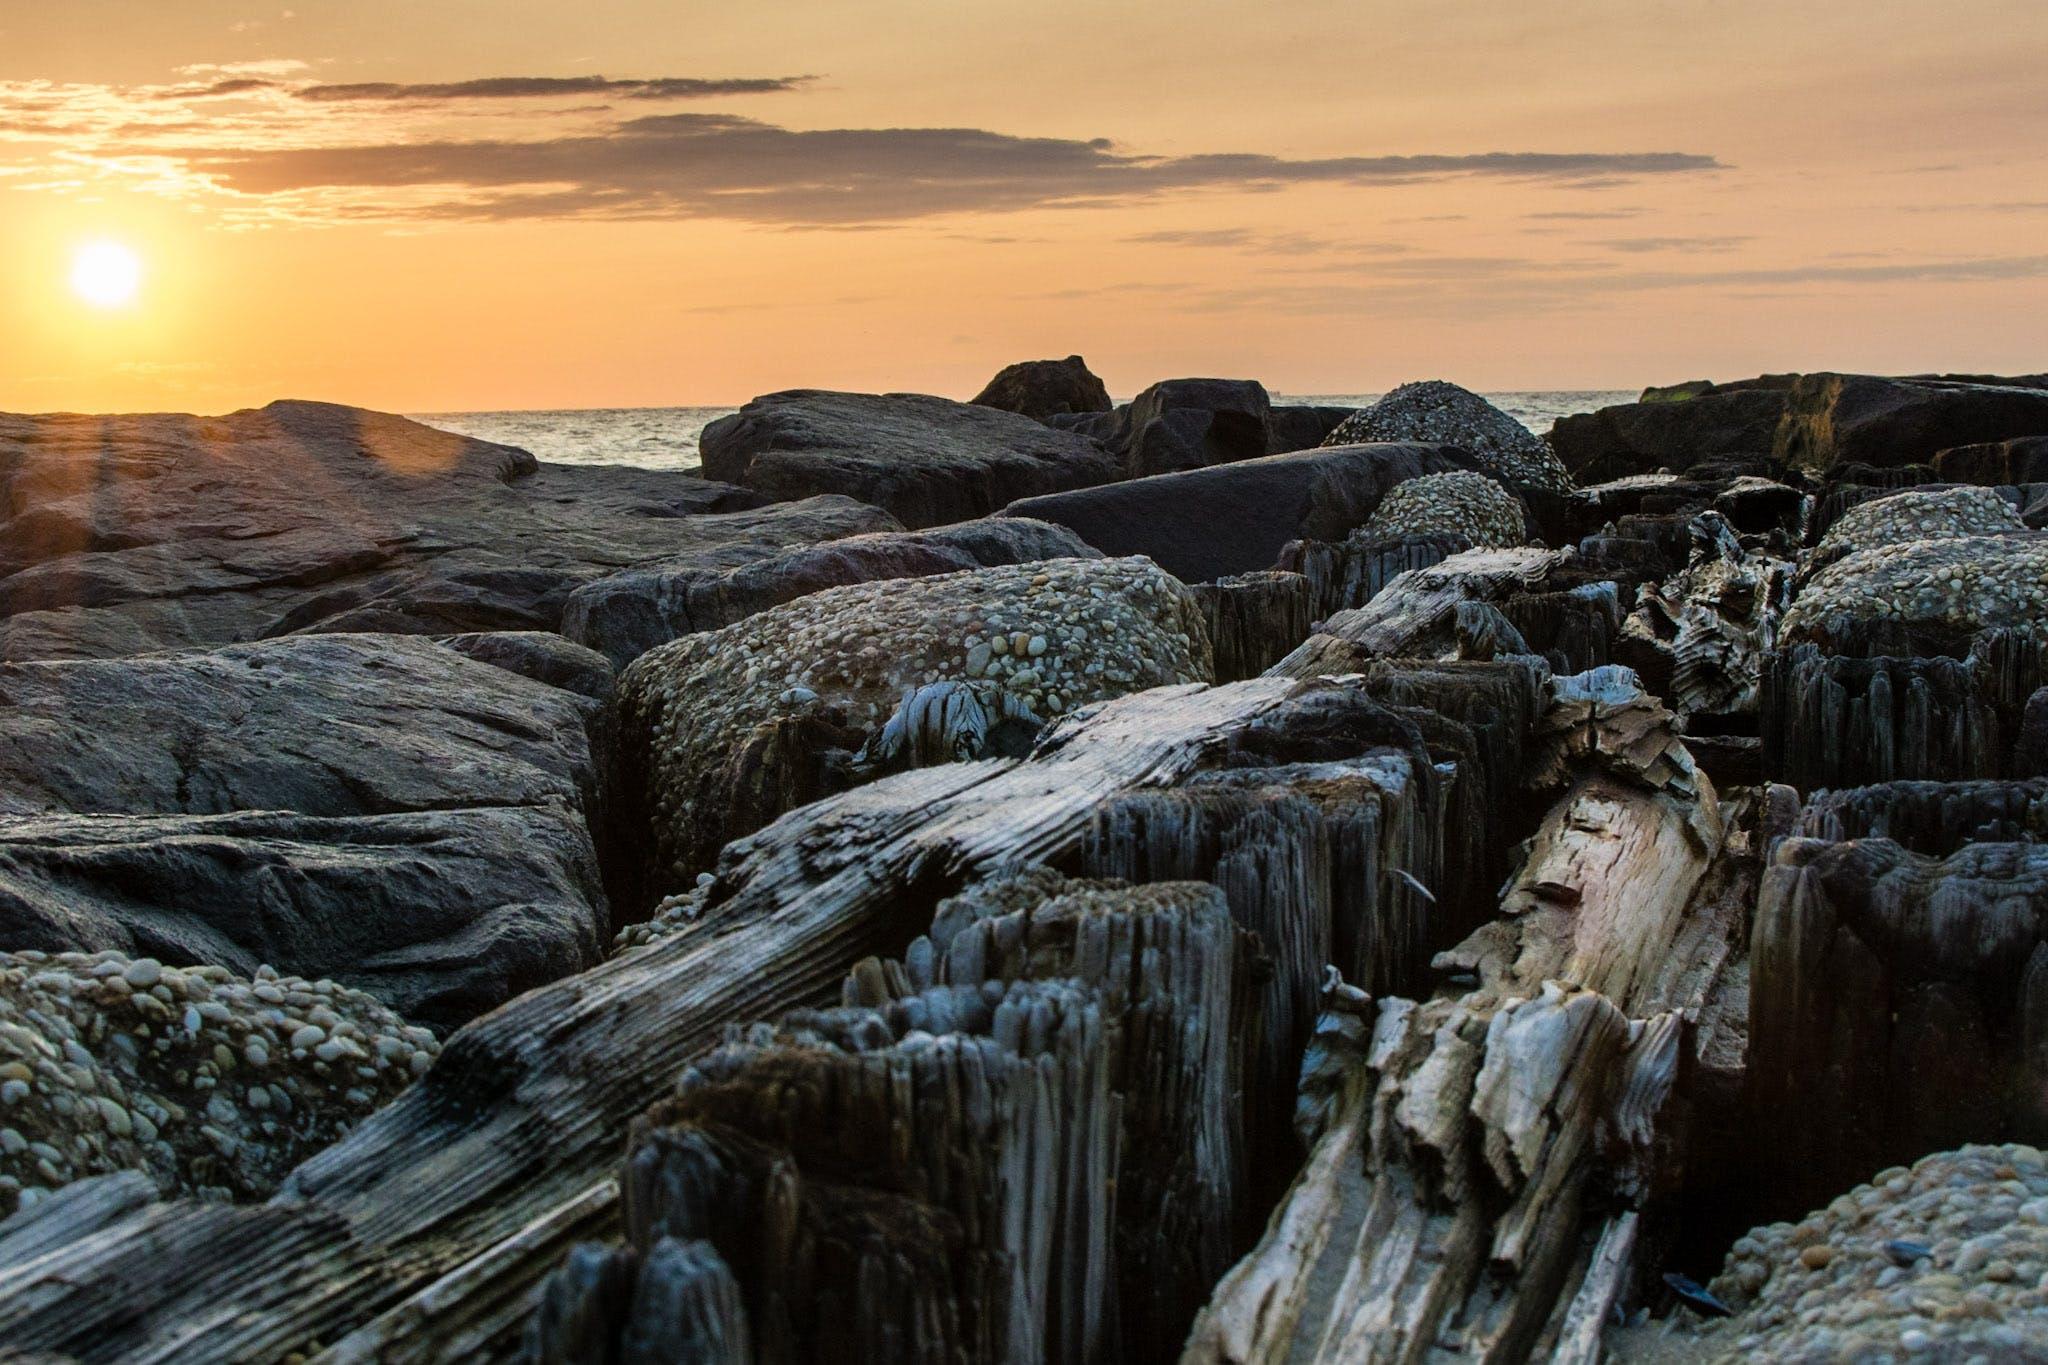 Free stock photo of beach, jetty, ocean, rocks